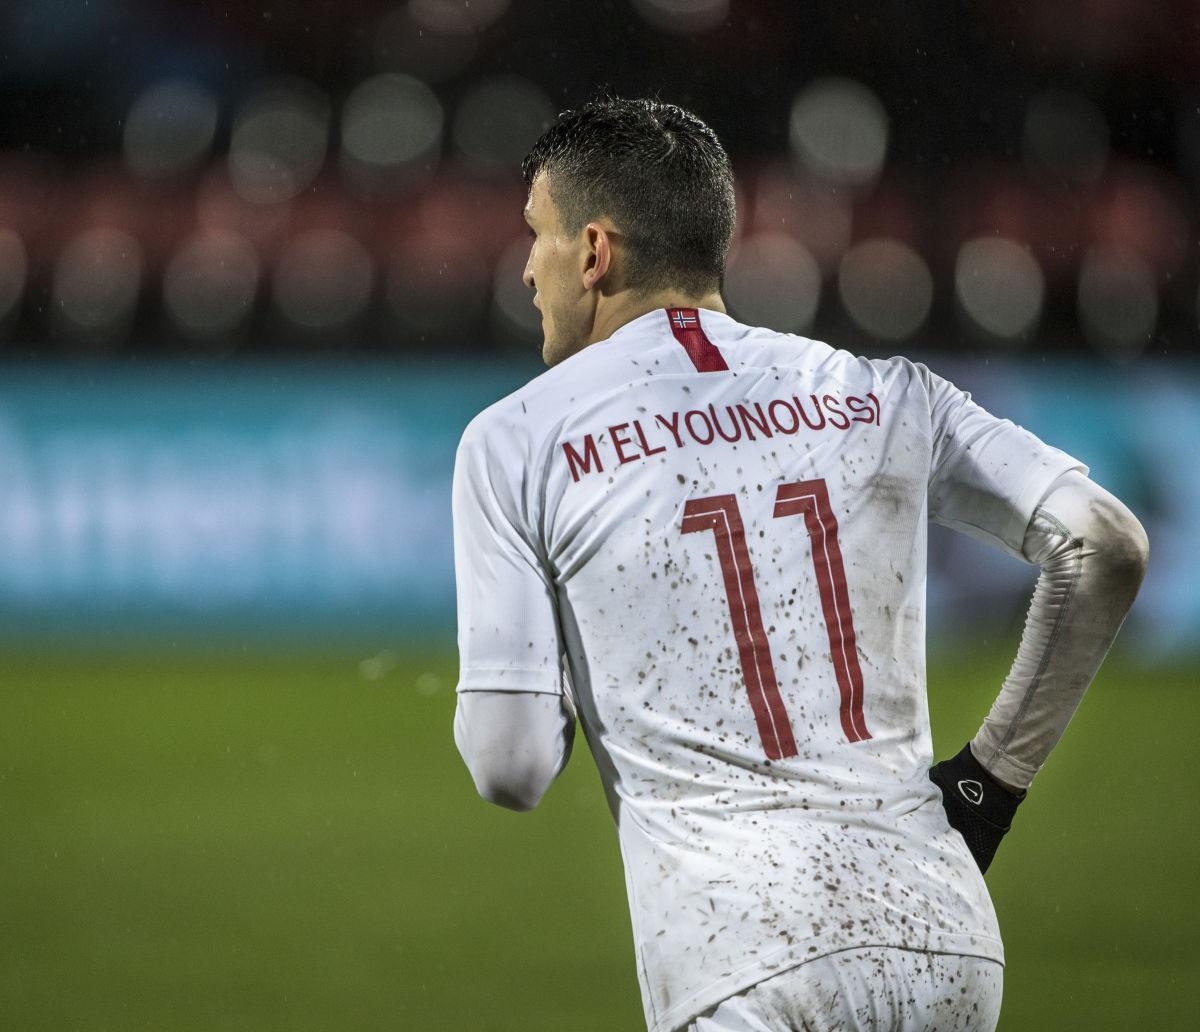 albania-v-norway-international-friendly-5b33874a3467ac16ea000020.jpg